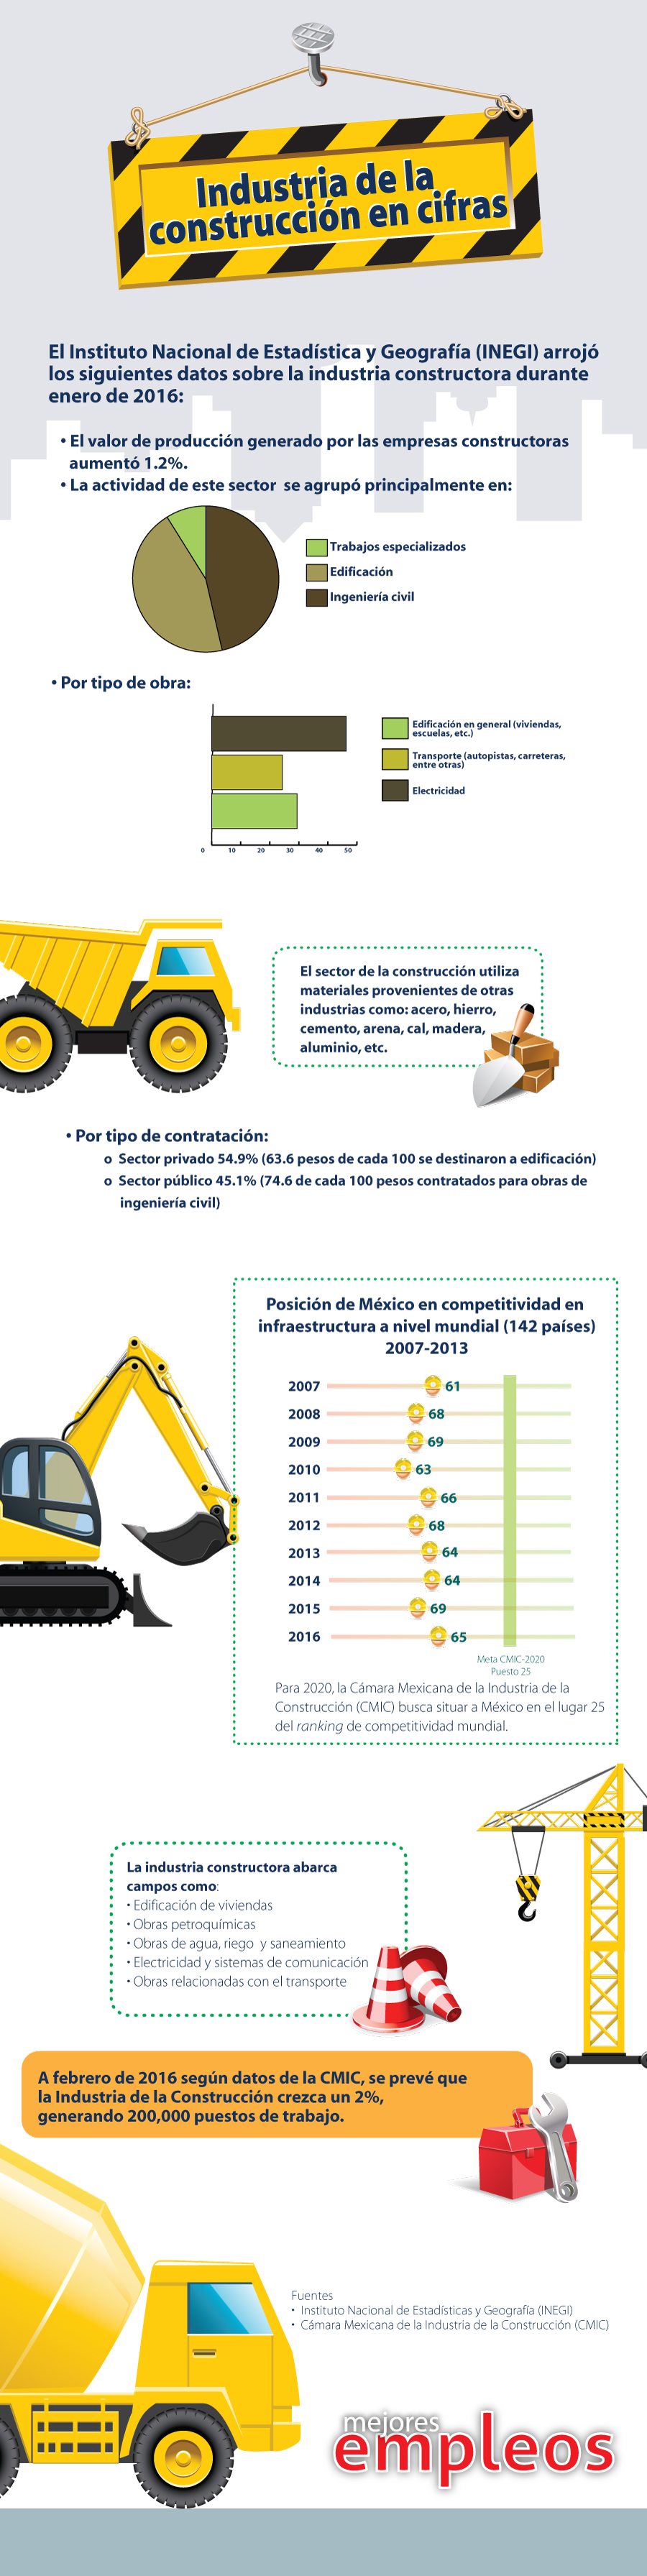 Infografia-ConstruccionWeb